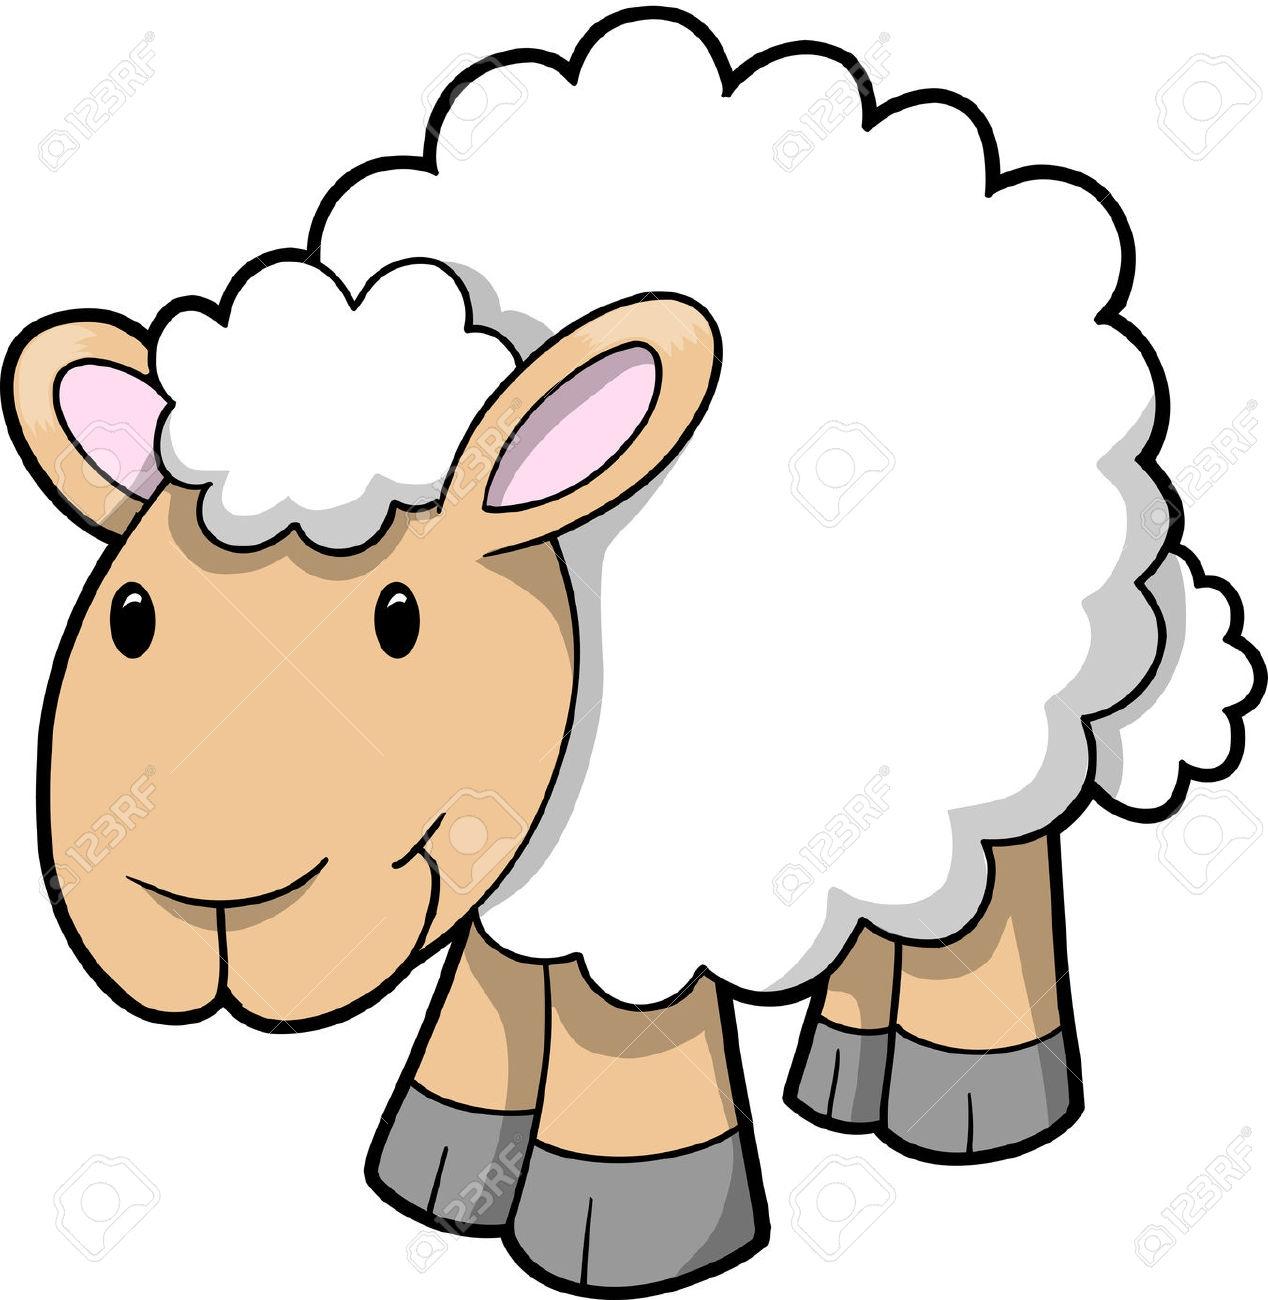 Shaun The Sheep Clipart at GetDrawings | Free download